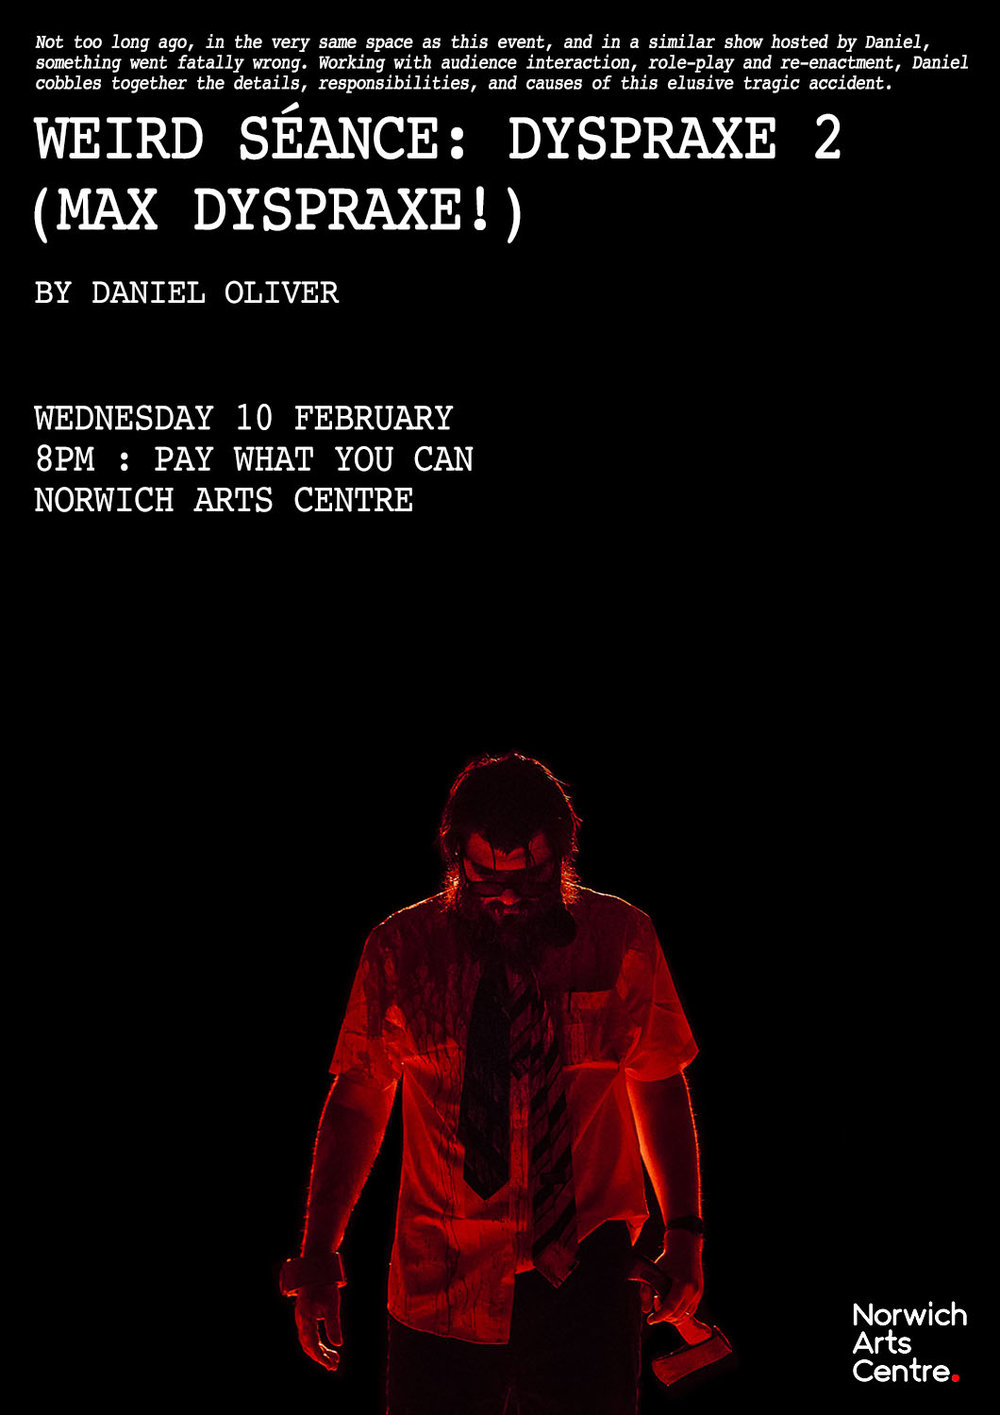 Daniel Oliver   Weird Séance: Dyspraxe 2 (Max Dyspraxe!)    Poster   Norwich, 2016